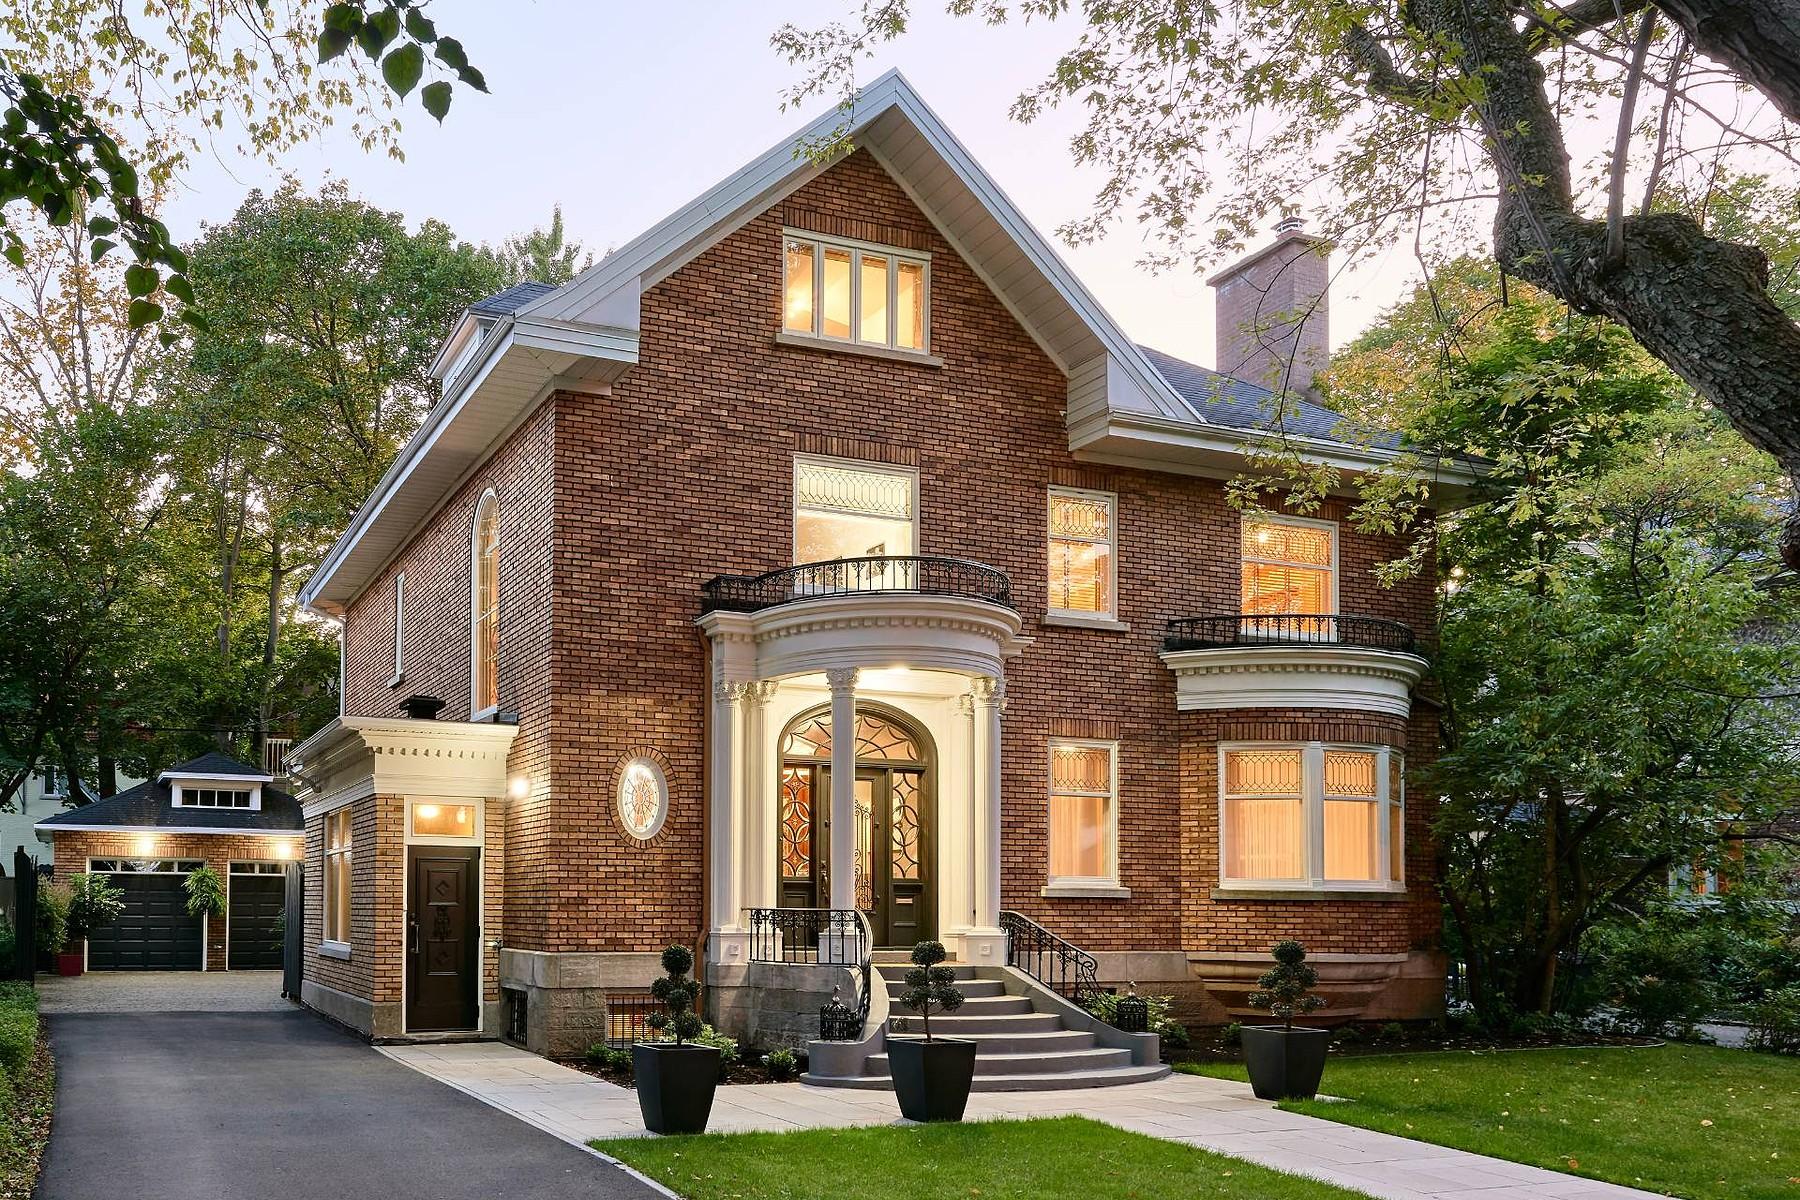 Single Family Homes for Sale at Sumptuous Montcalm Residence 1110 Av. De Bougainville Quebec, Quebec G1S3A8 Canada